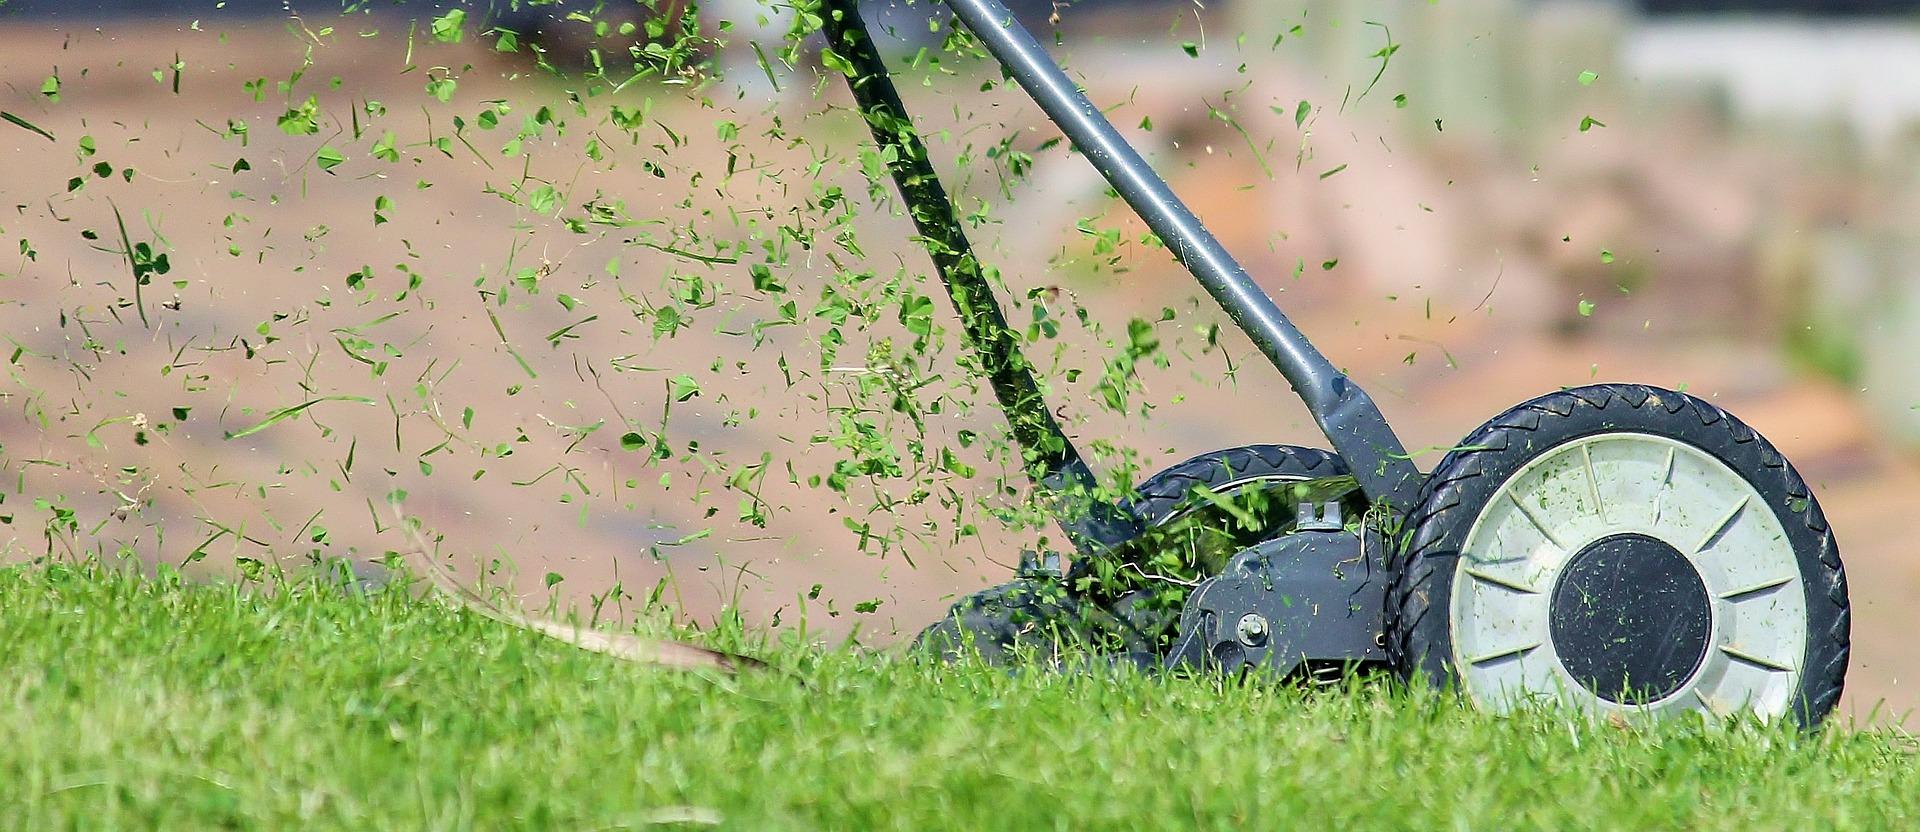 Učinkovita oprema za delo na vrtu